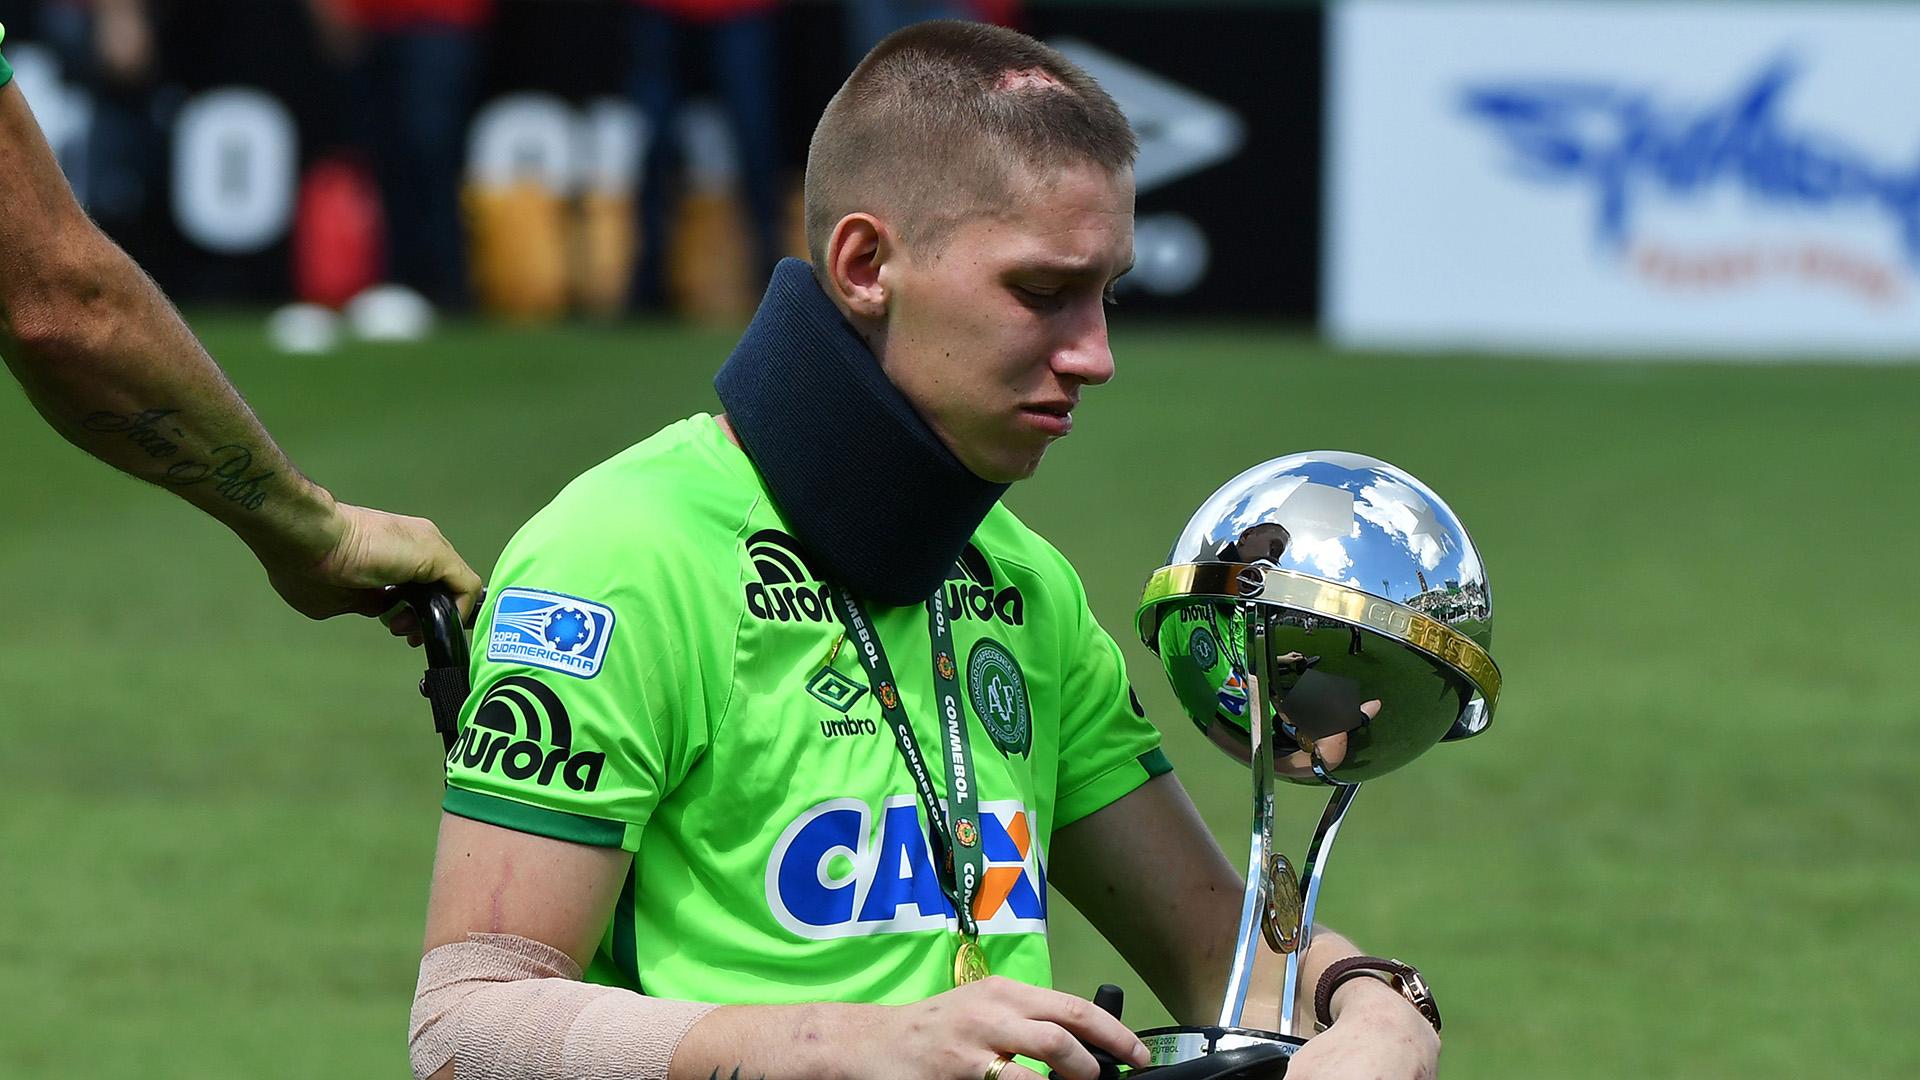 Follmann Palmeiras Chapecoense Amistoso homenagem 21012017